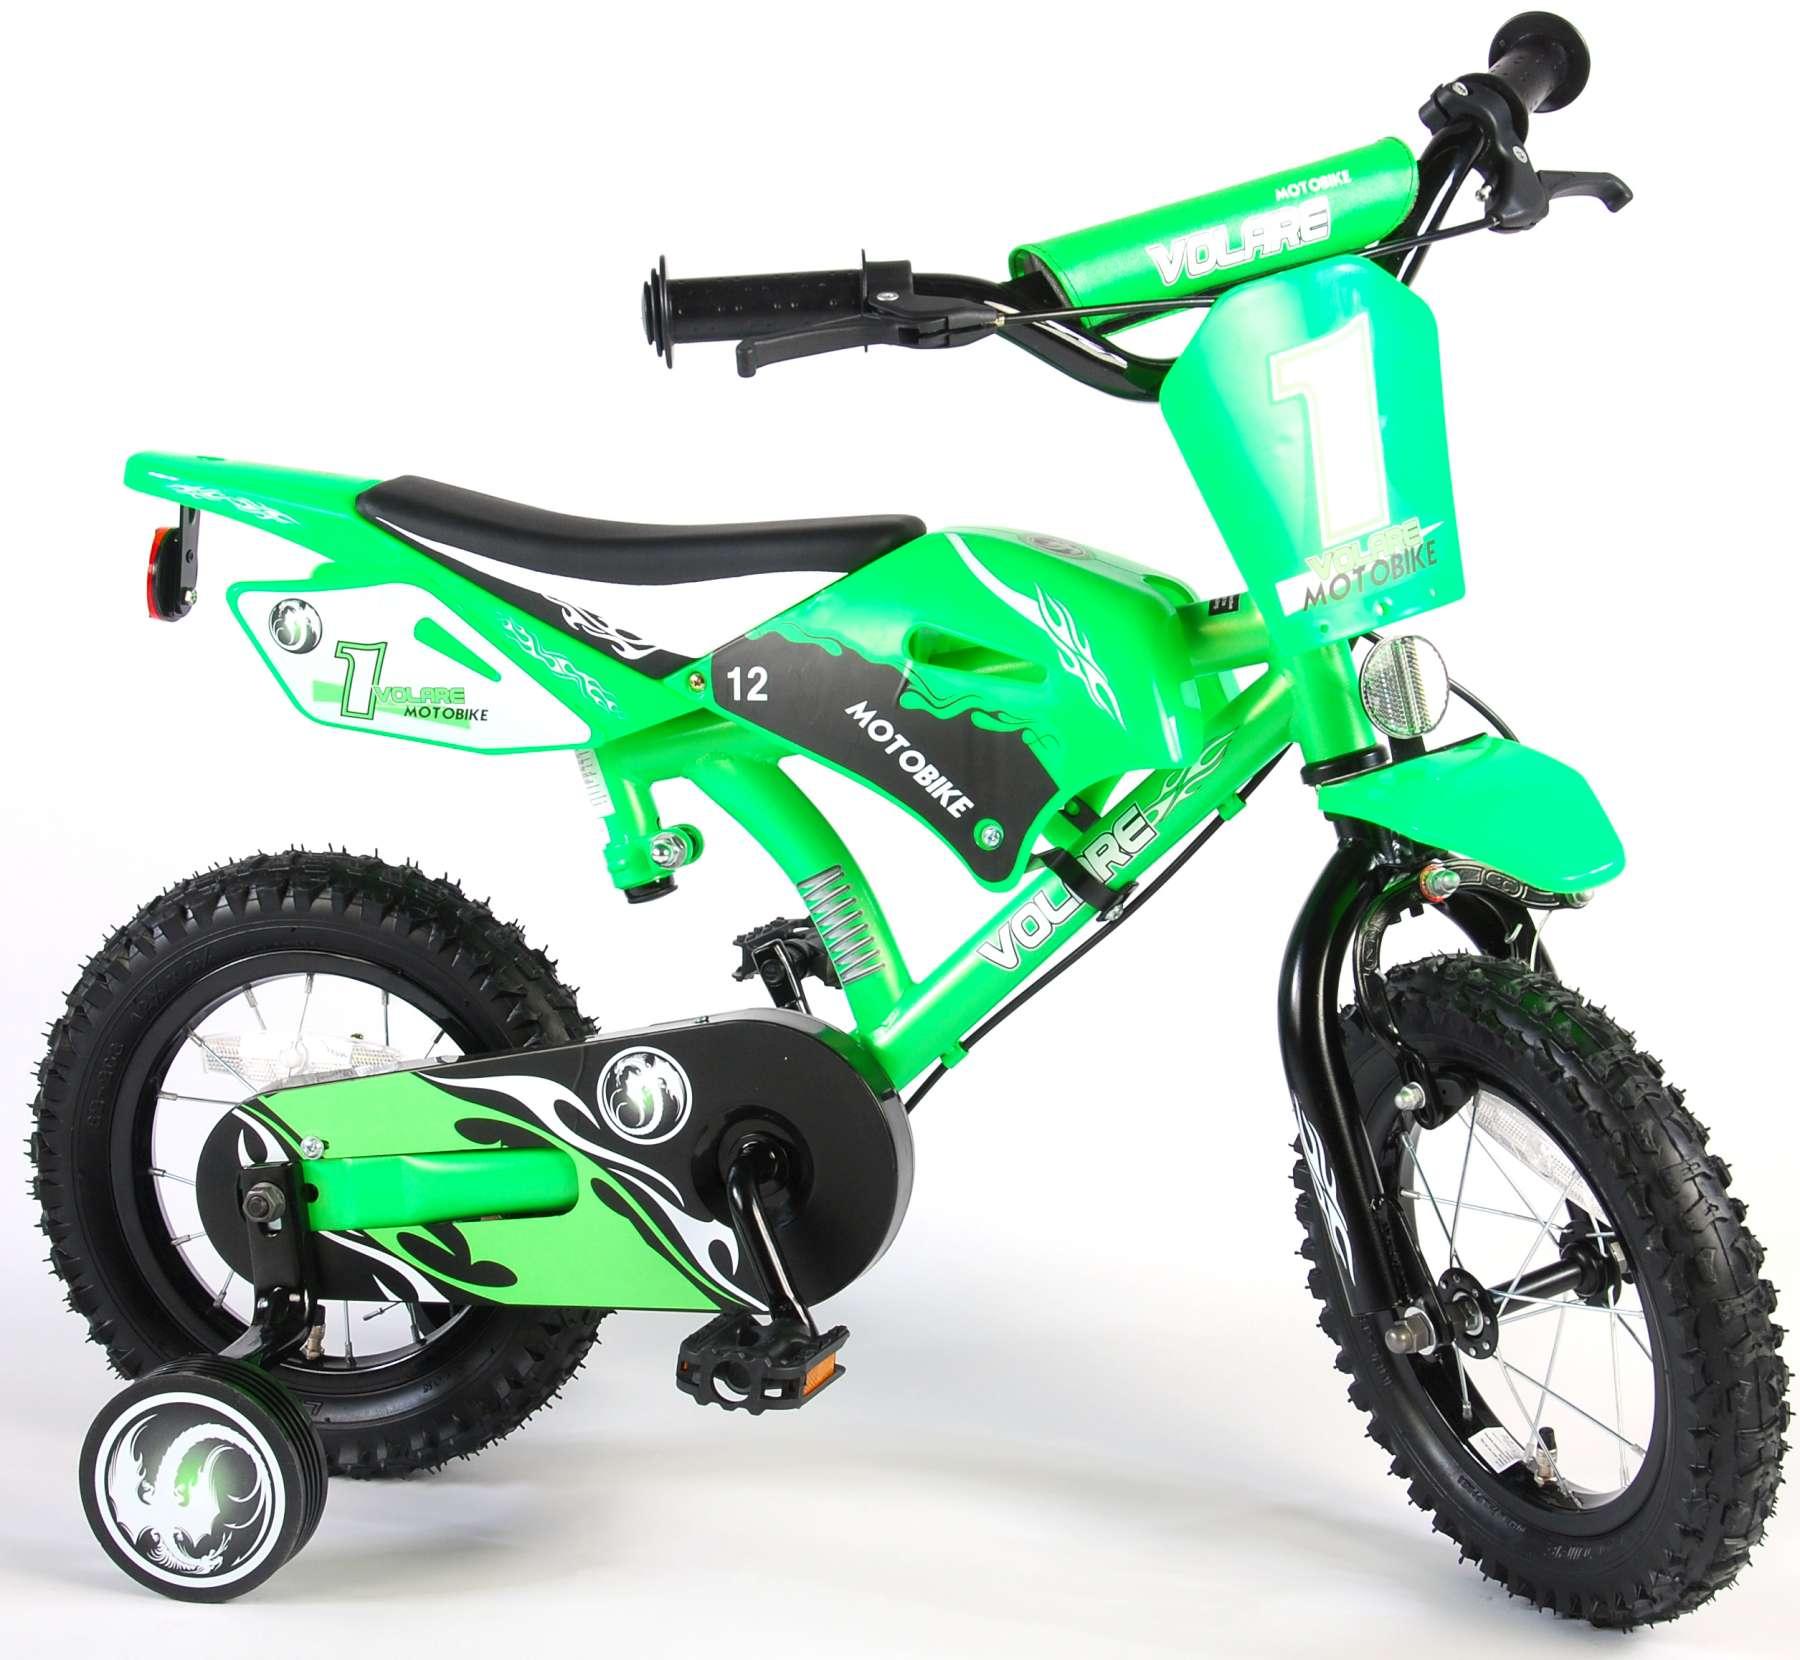 Bicicleta Motorbike de 12 pulgadas Verde - vista lateral der.